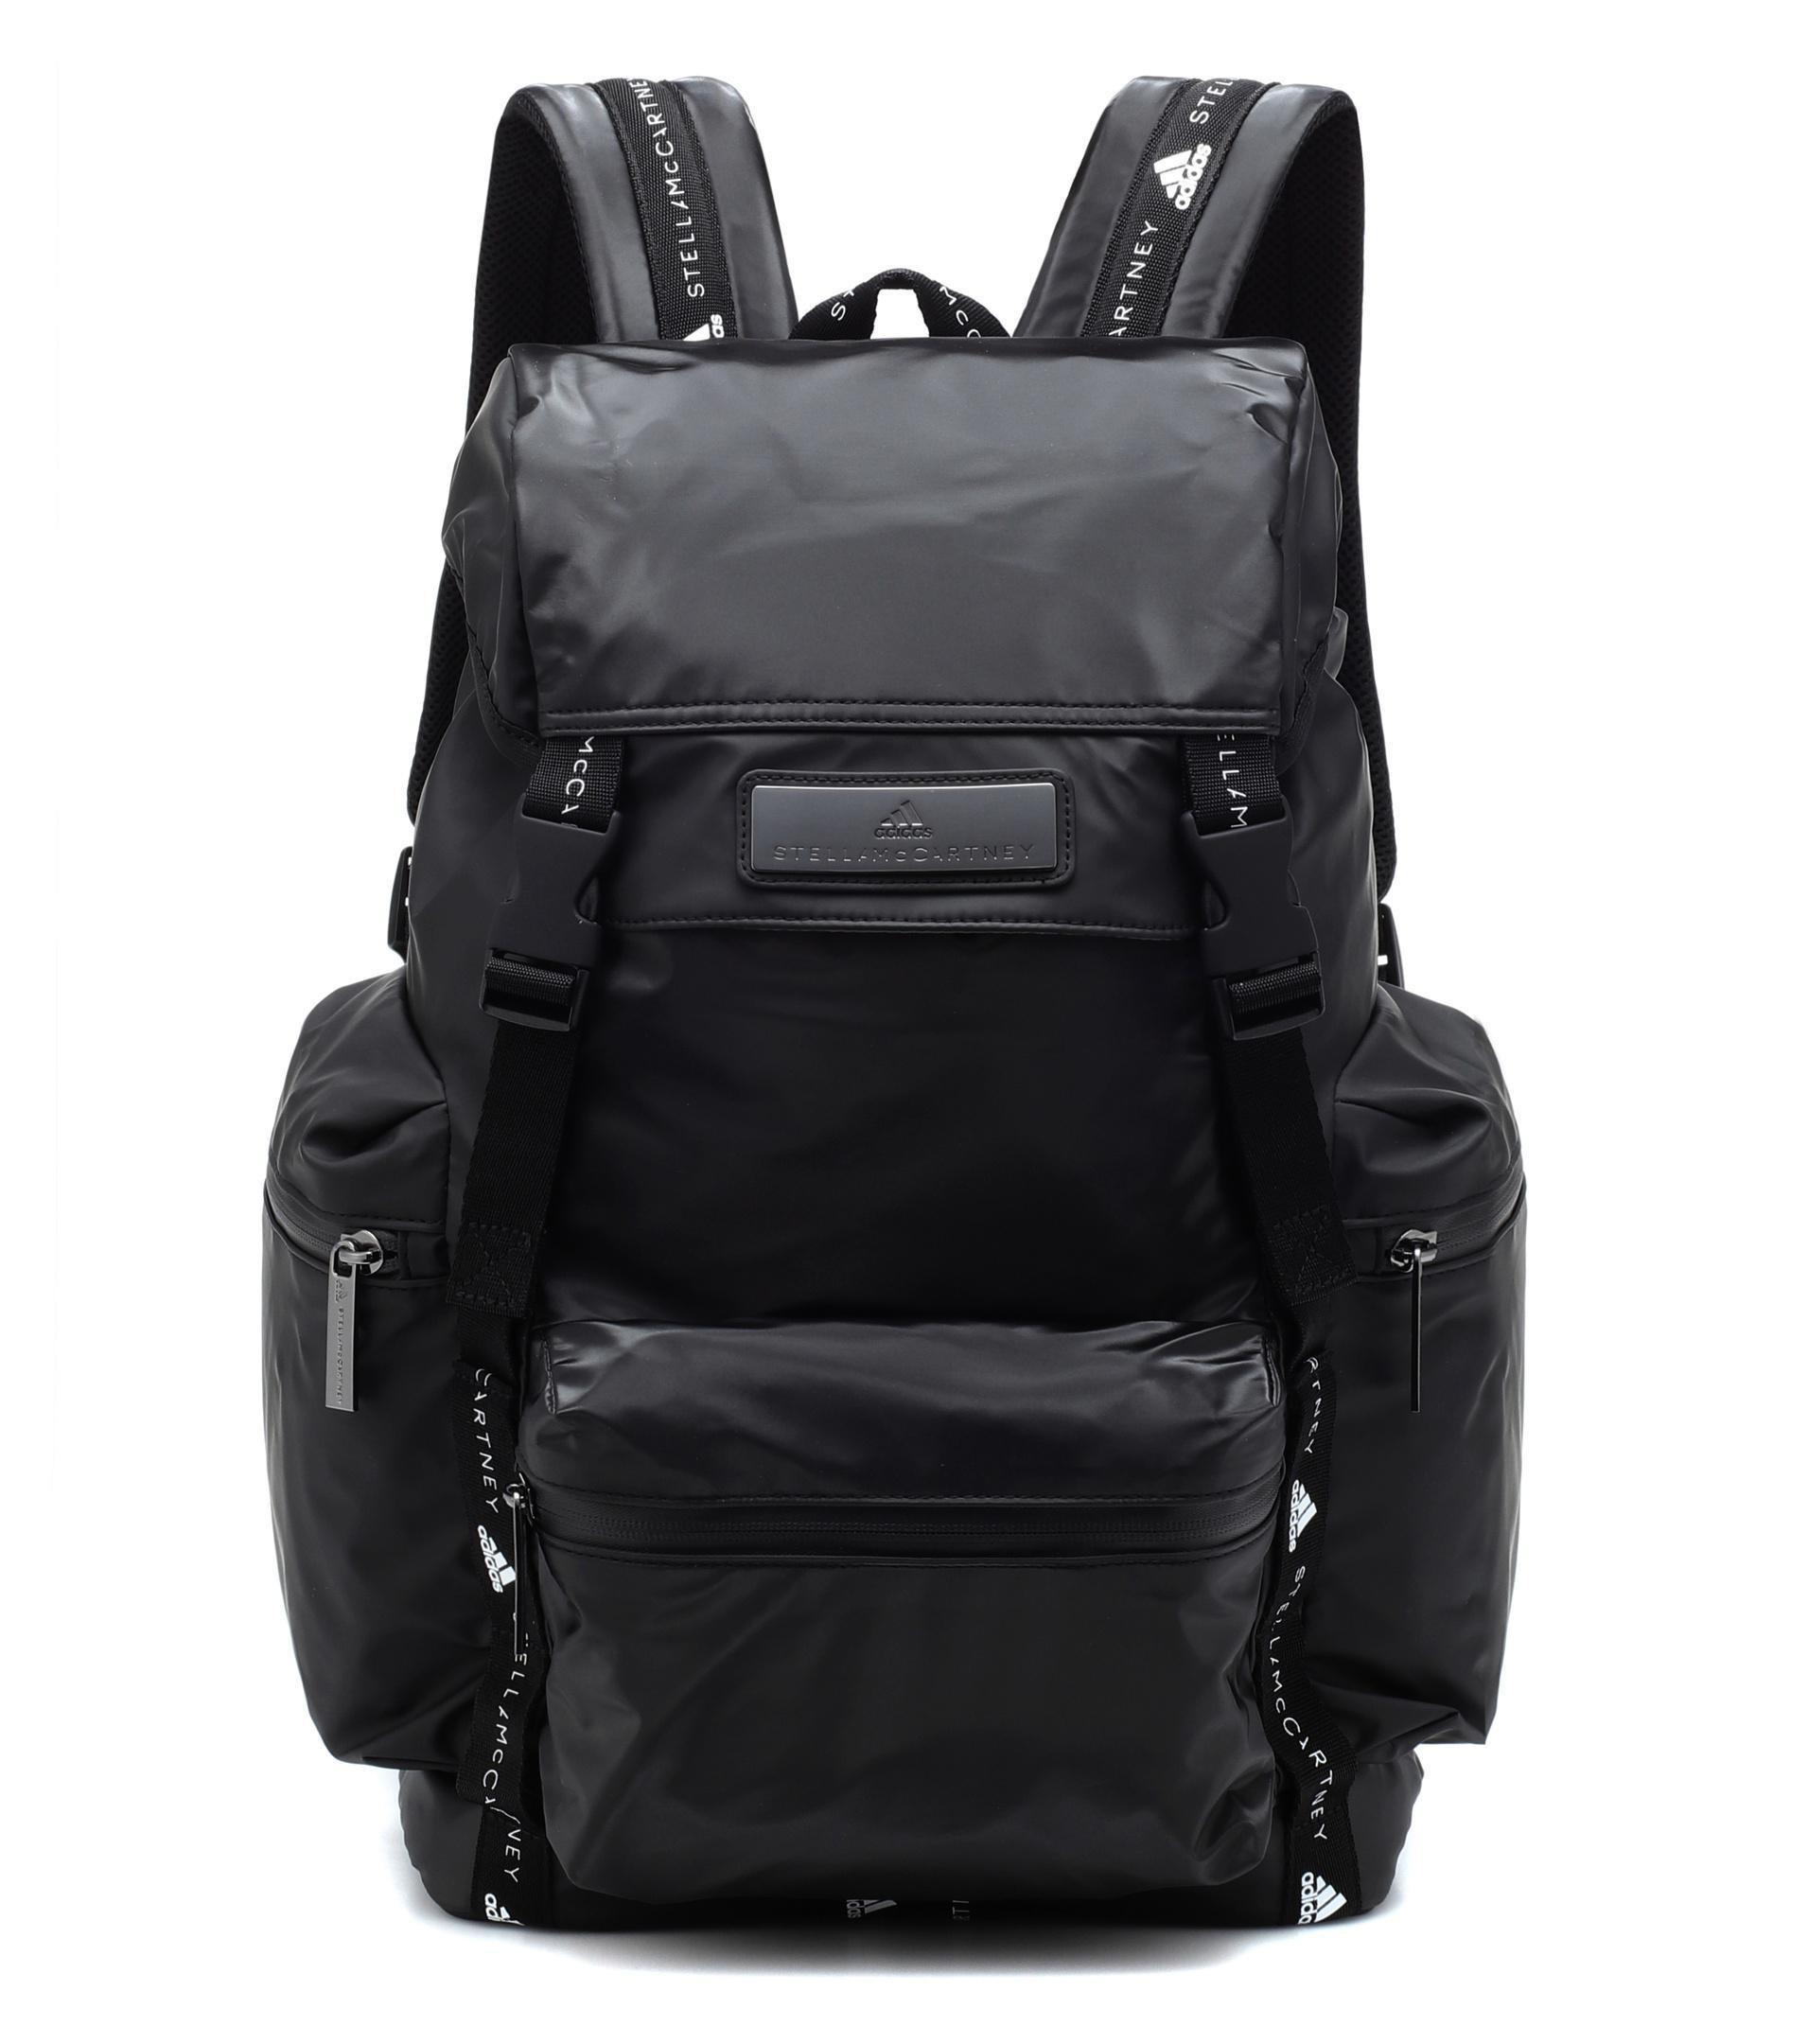 5bca86f1911c Lyst - Adidas By Stella Mccartney Technical Fabric Backpack in Black